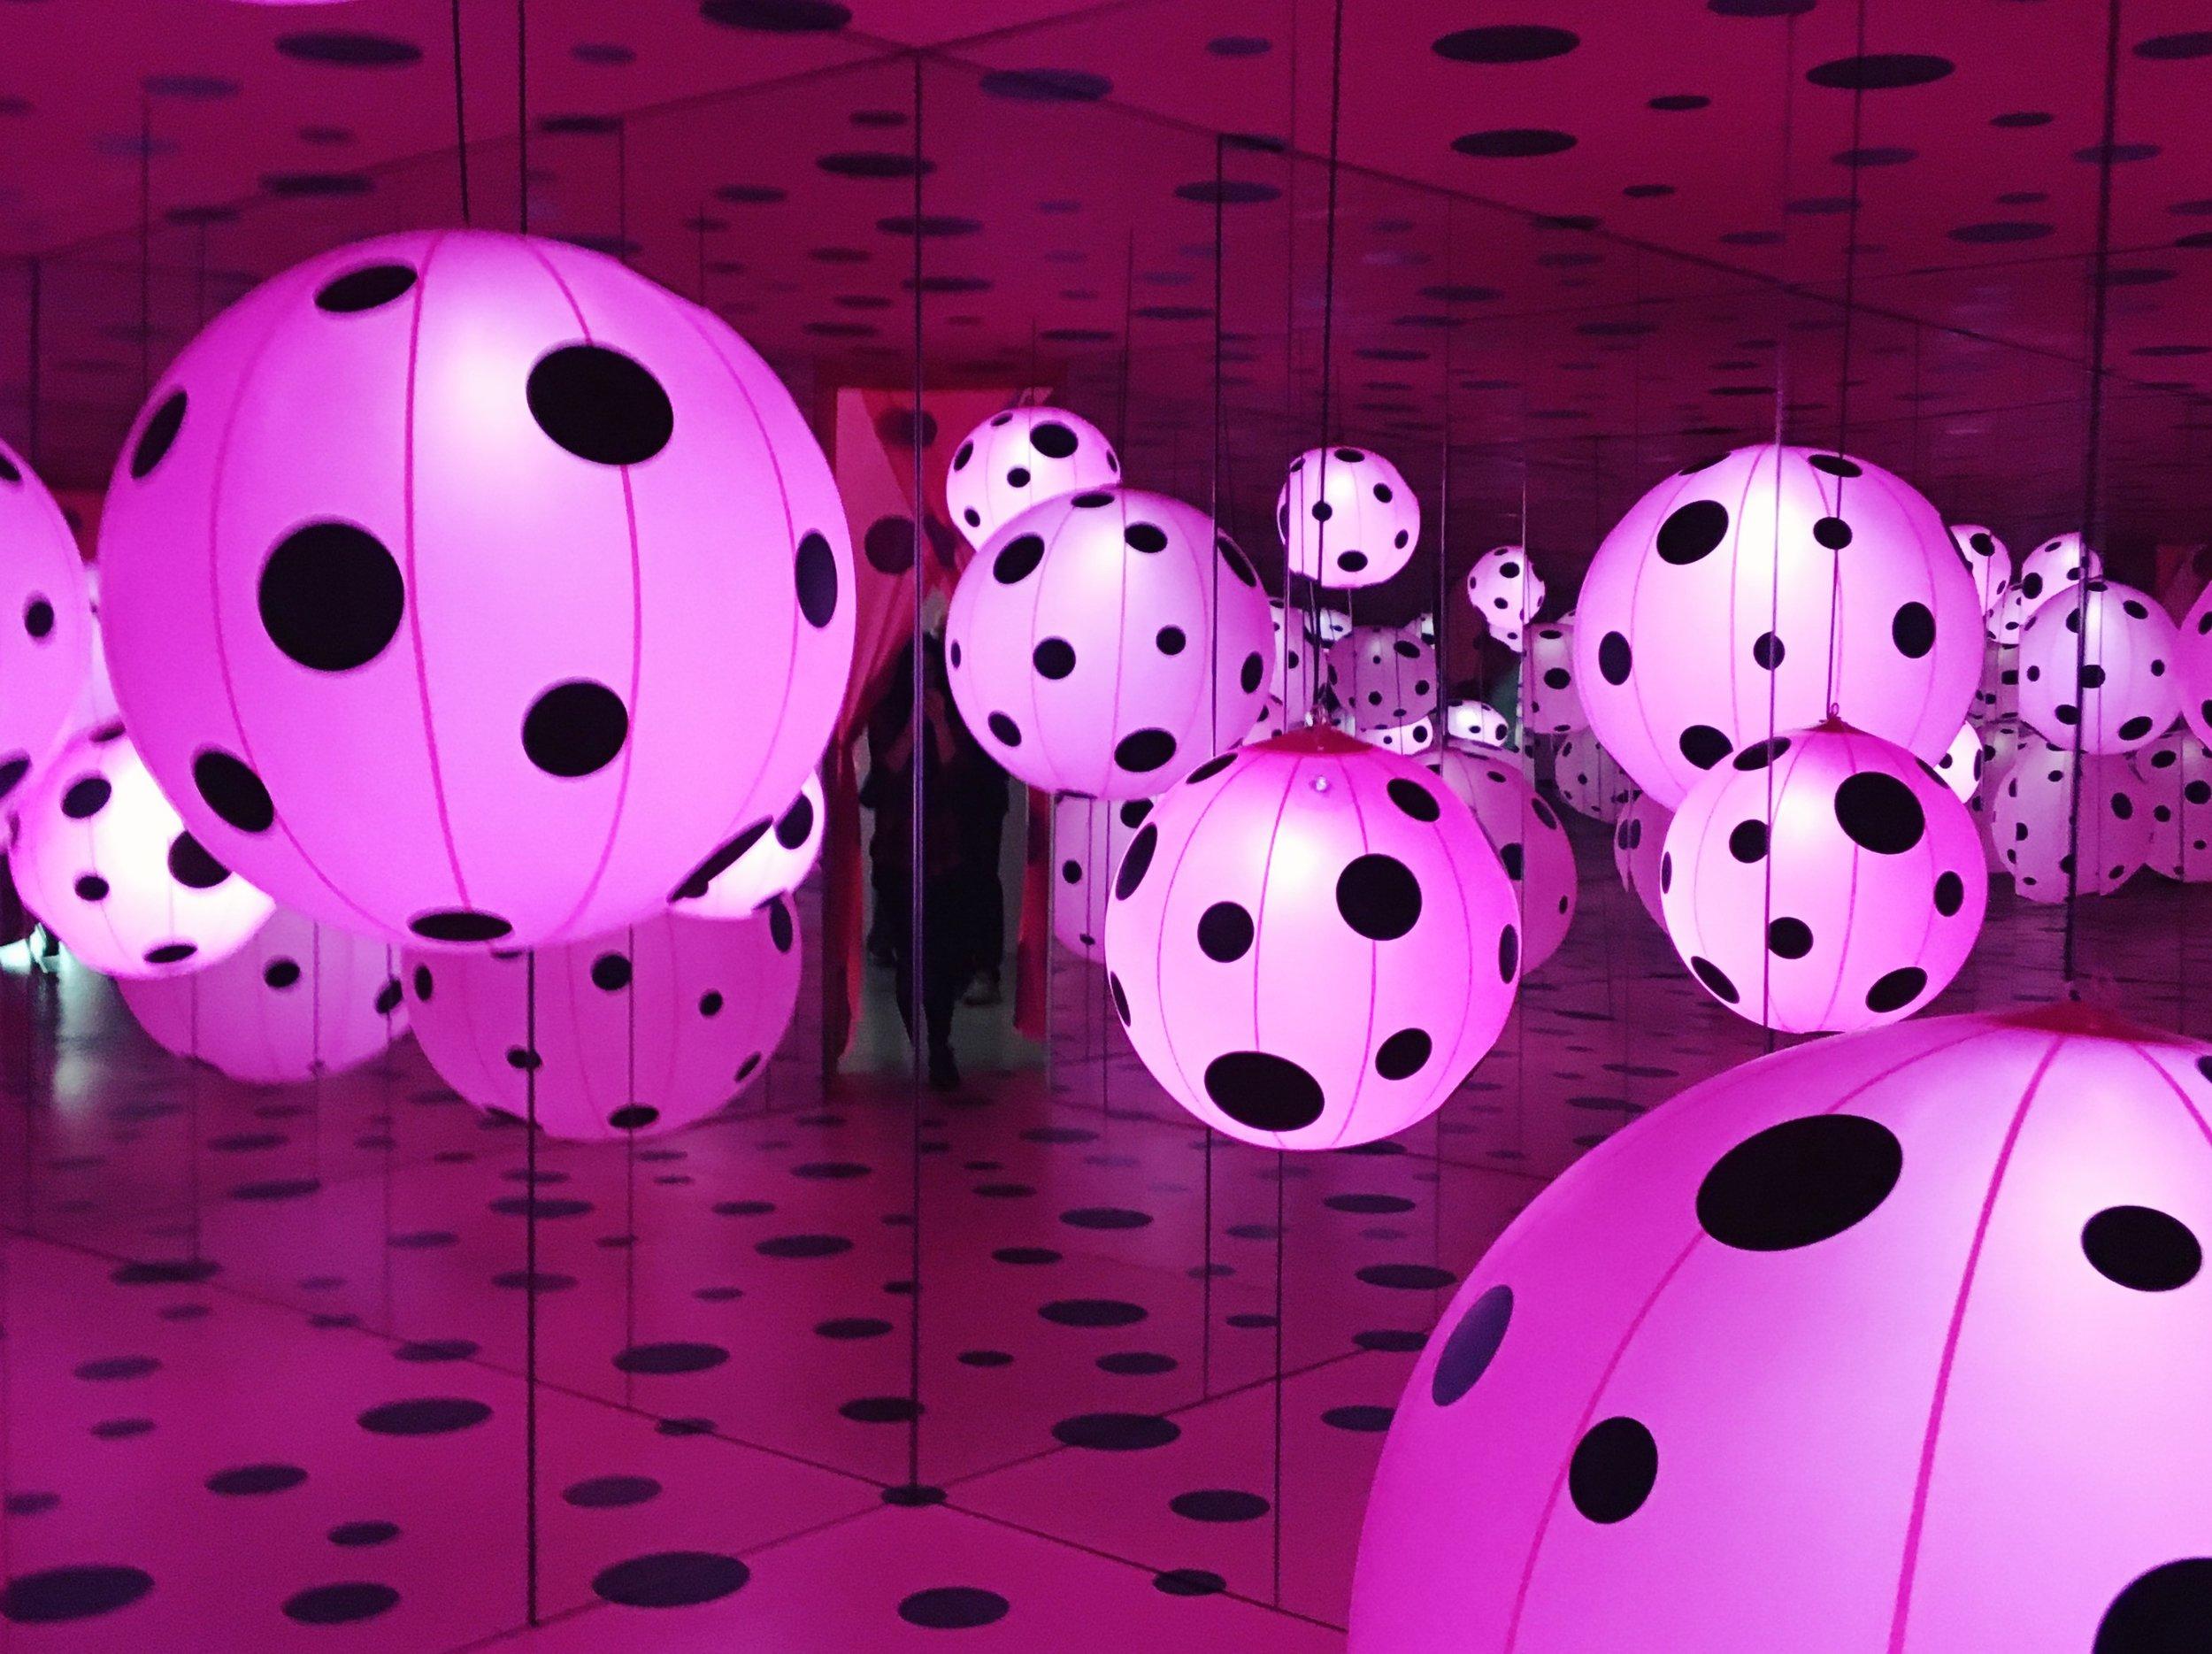 Dots Obsession – Love Transformed into Dots, Yayoi Kusama